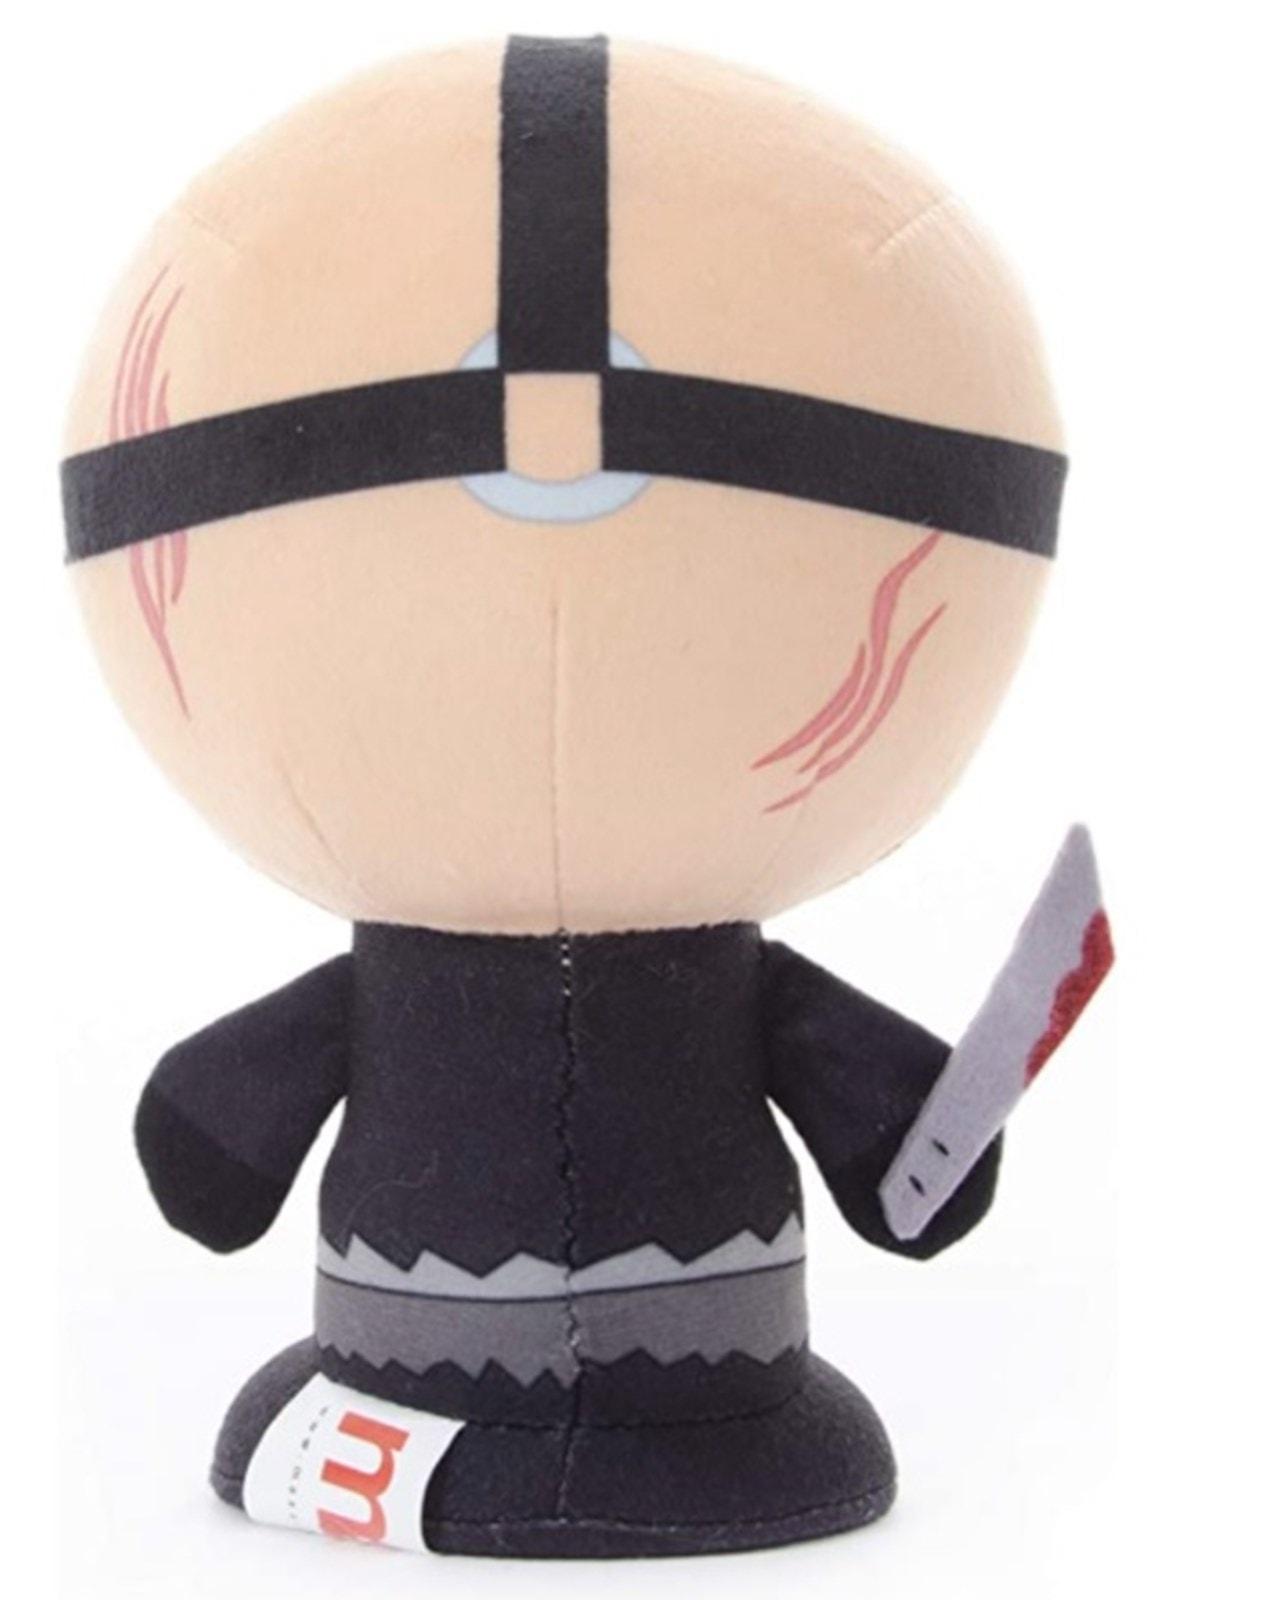 Jason: Friday 13th Plush Toy - 2